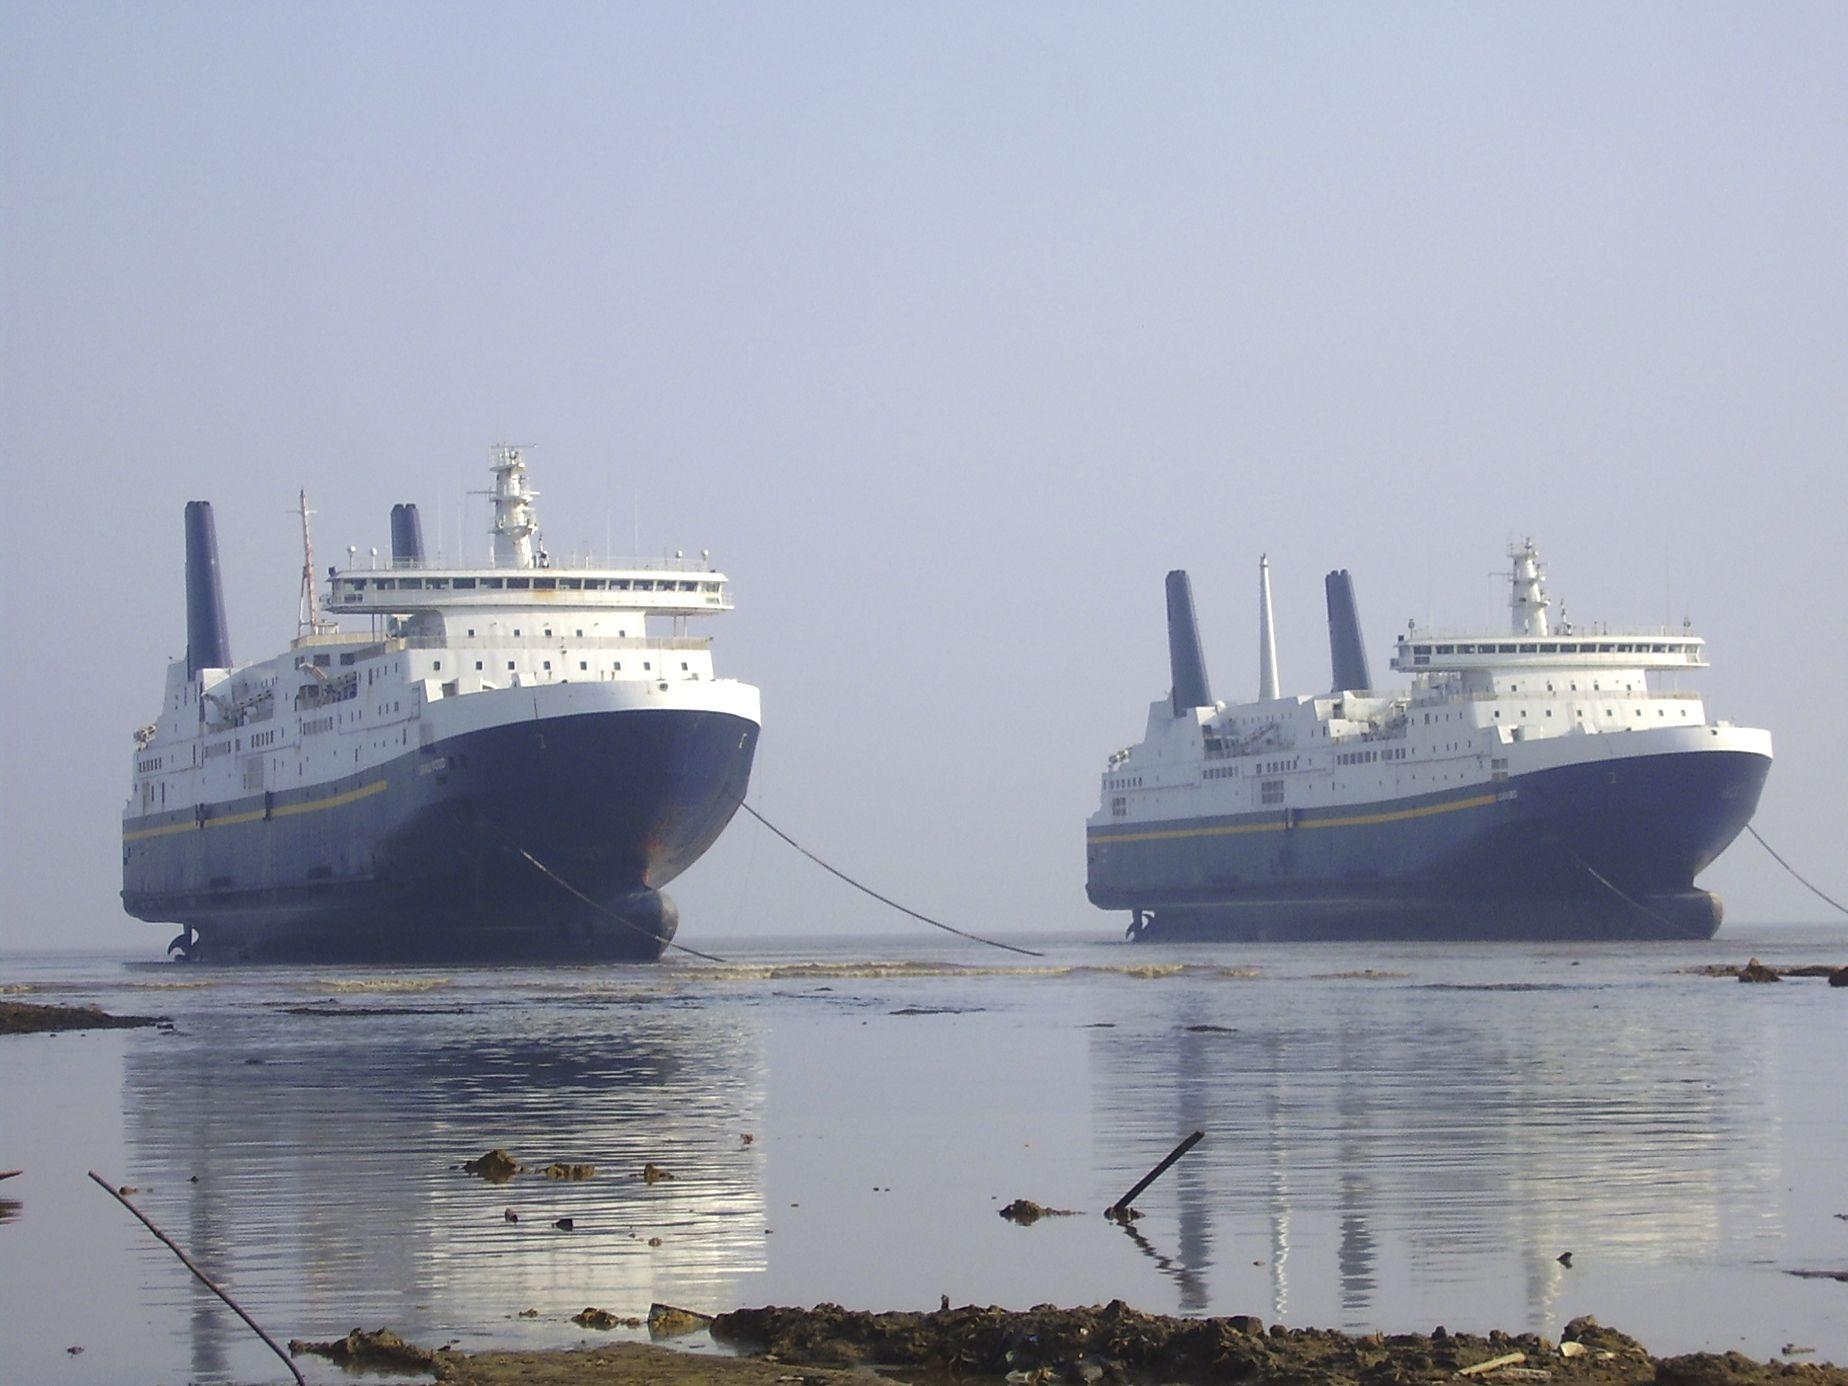 Alang Ship Google Search Ships Miscellaneous Ship Ship Ship Breaking Abandoned Ships